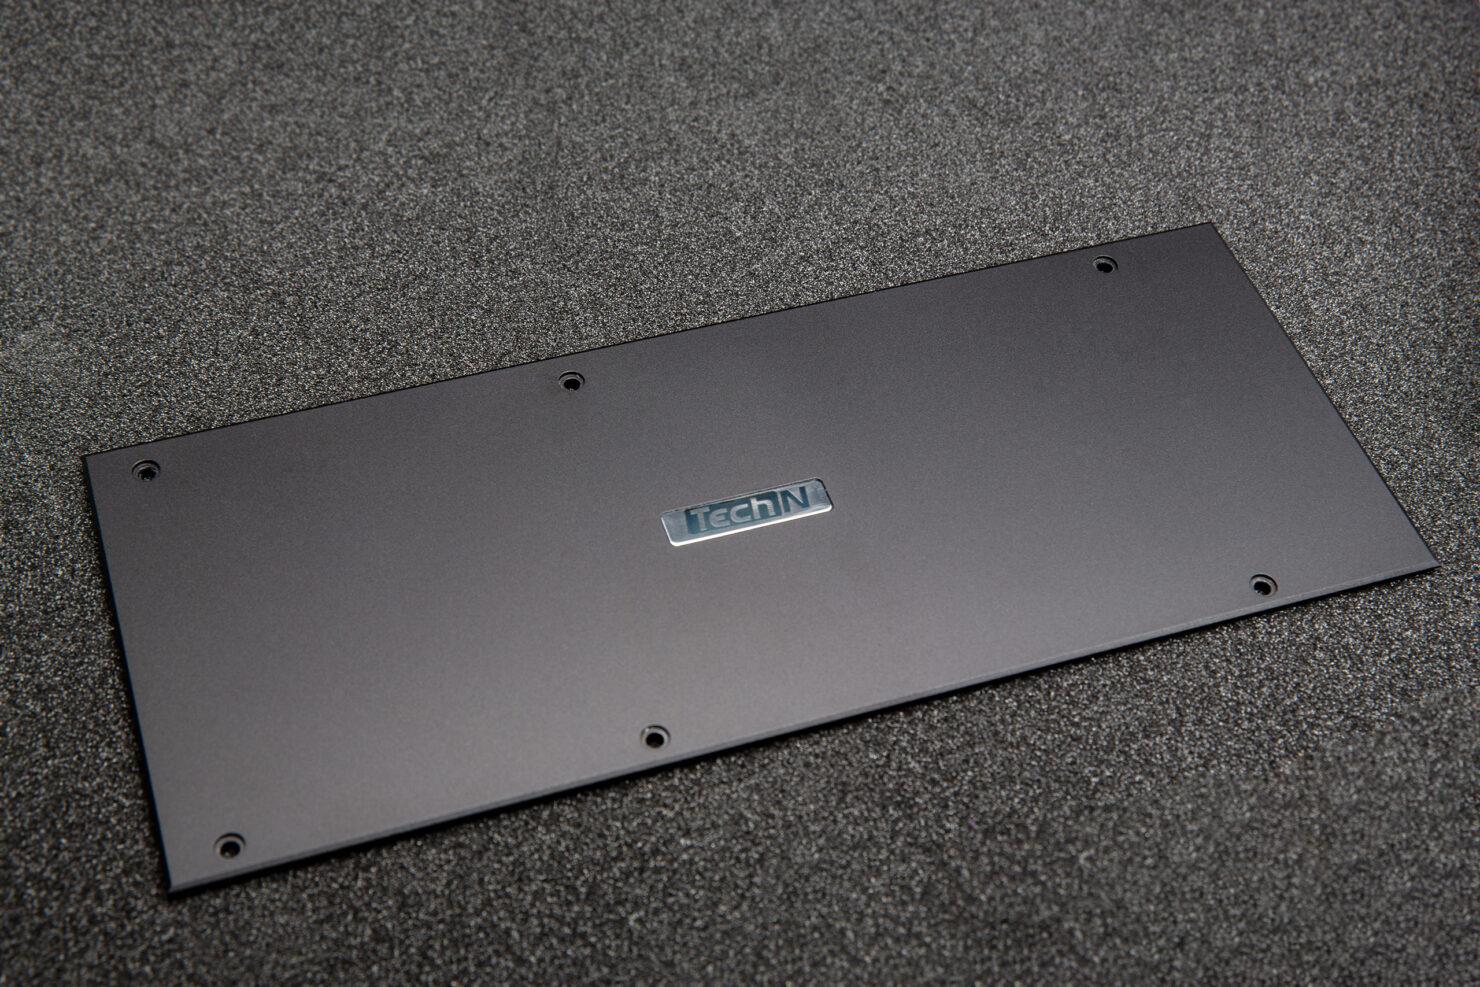 techn-water-block-pure-copper-for-amd-radeon-rx-6900-xt-rx-6800-xt-rx-6800-gpus-_7